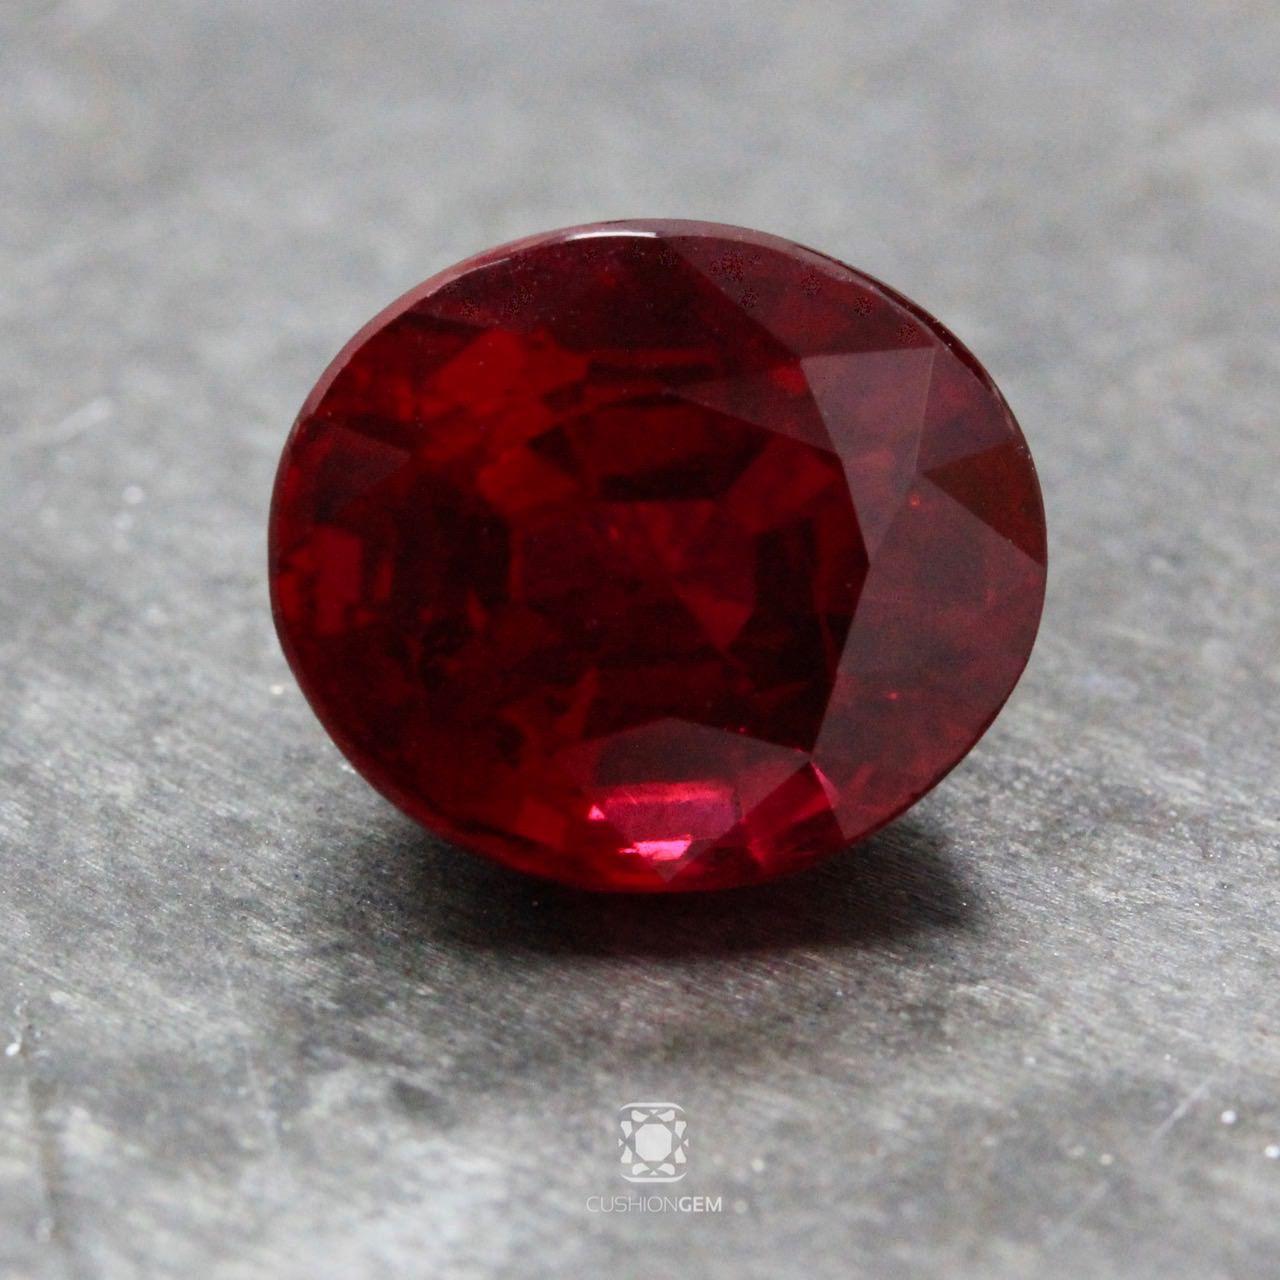 6.02 Oval Burma Ruby